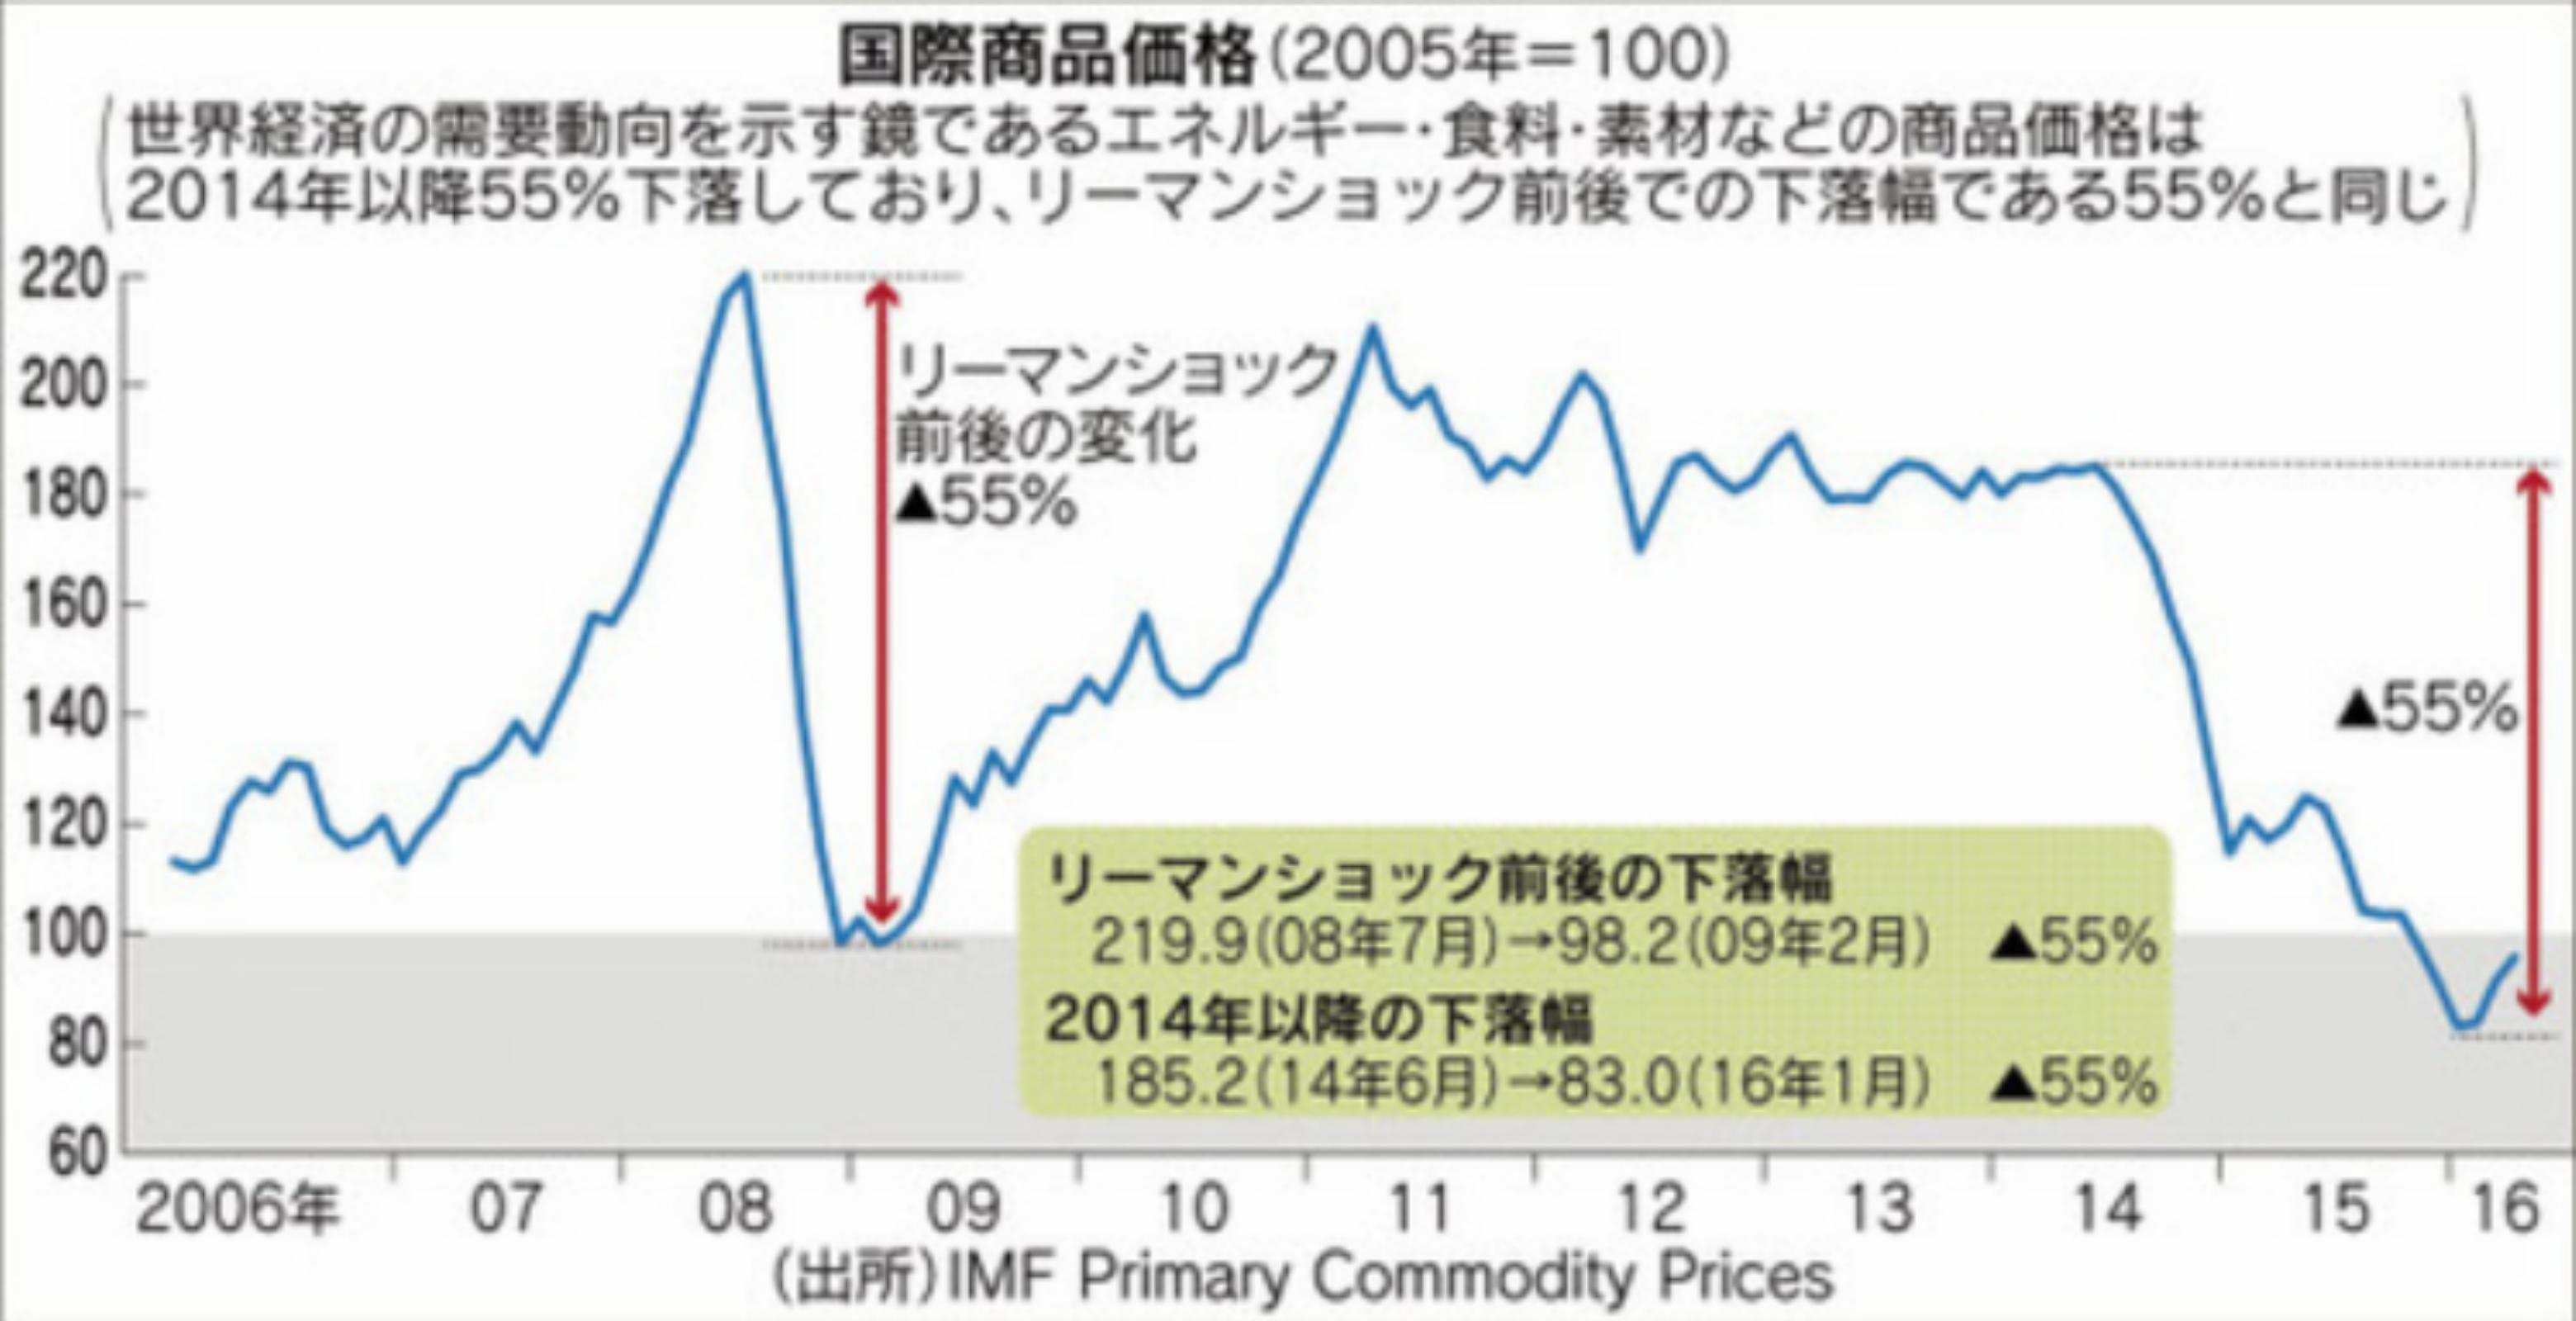 国際商品価格の推移